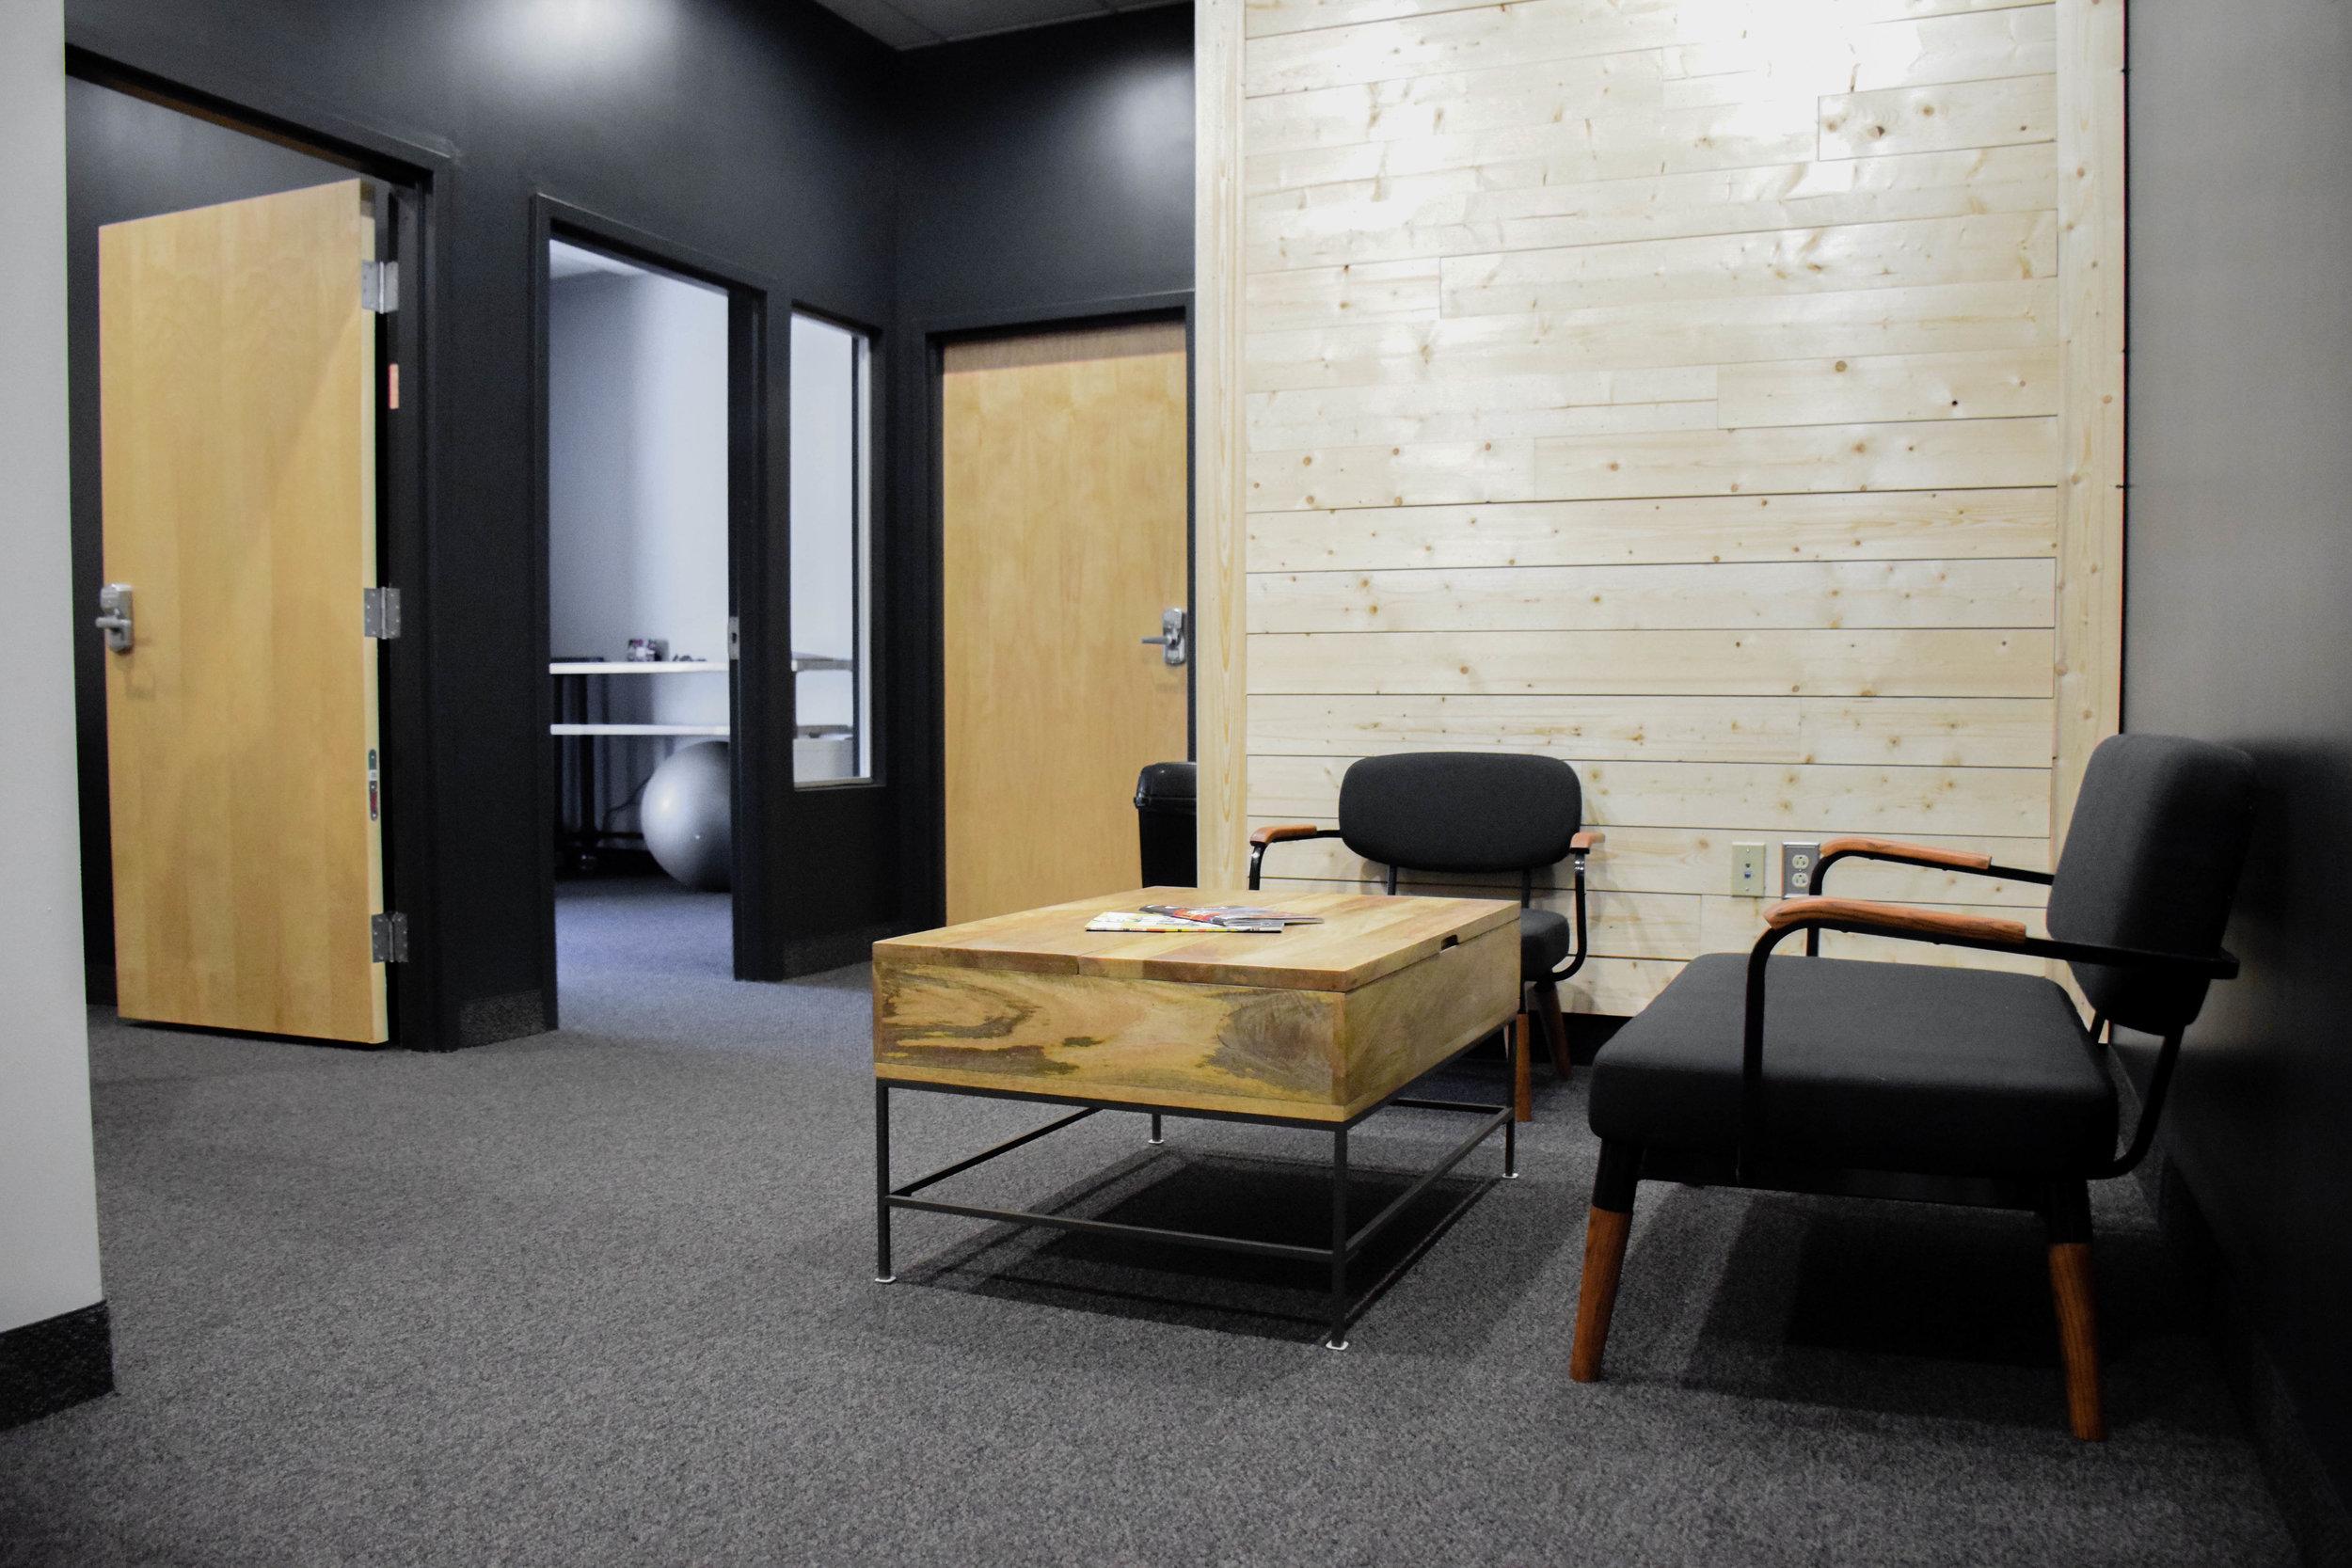 industrial workspace design | pelaia media group-0731.jpg